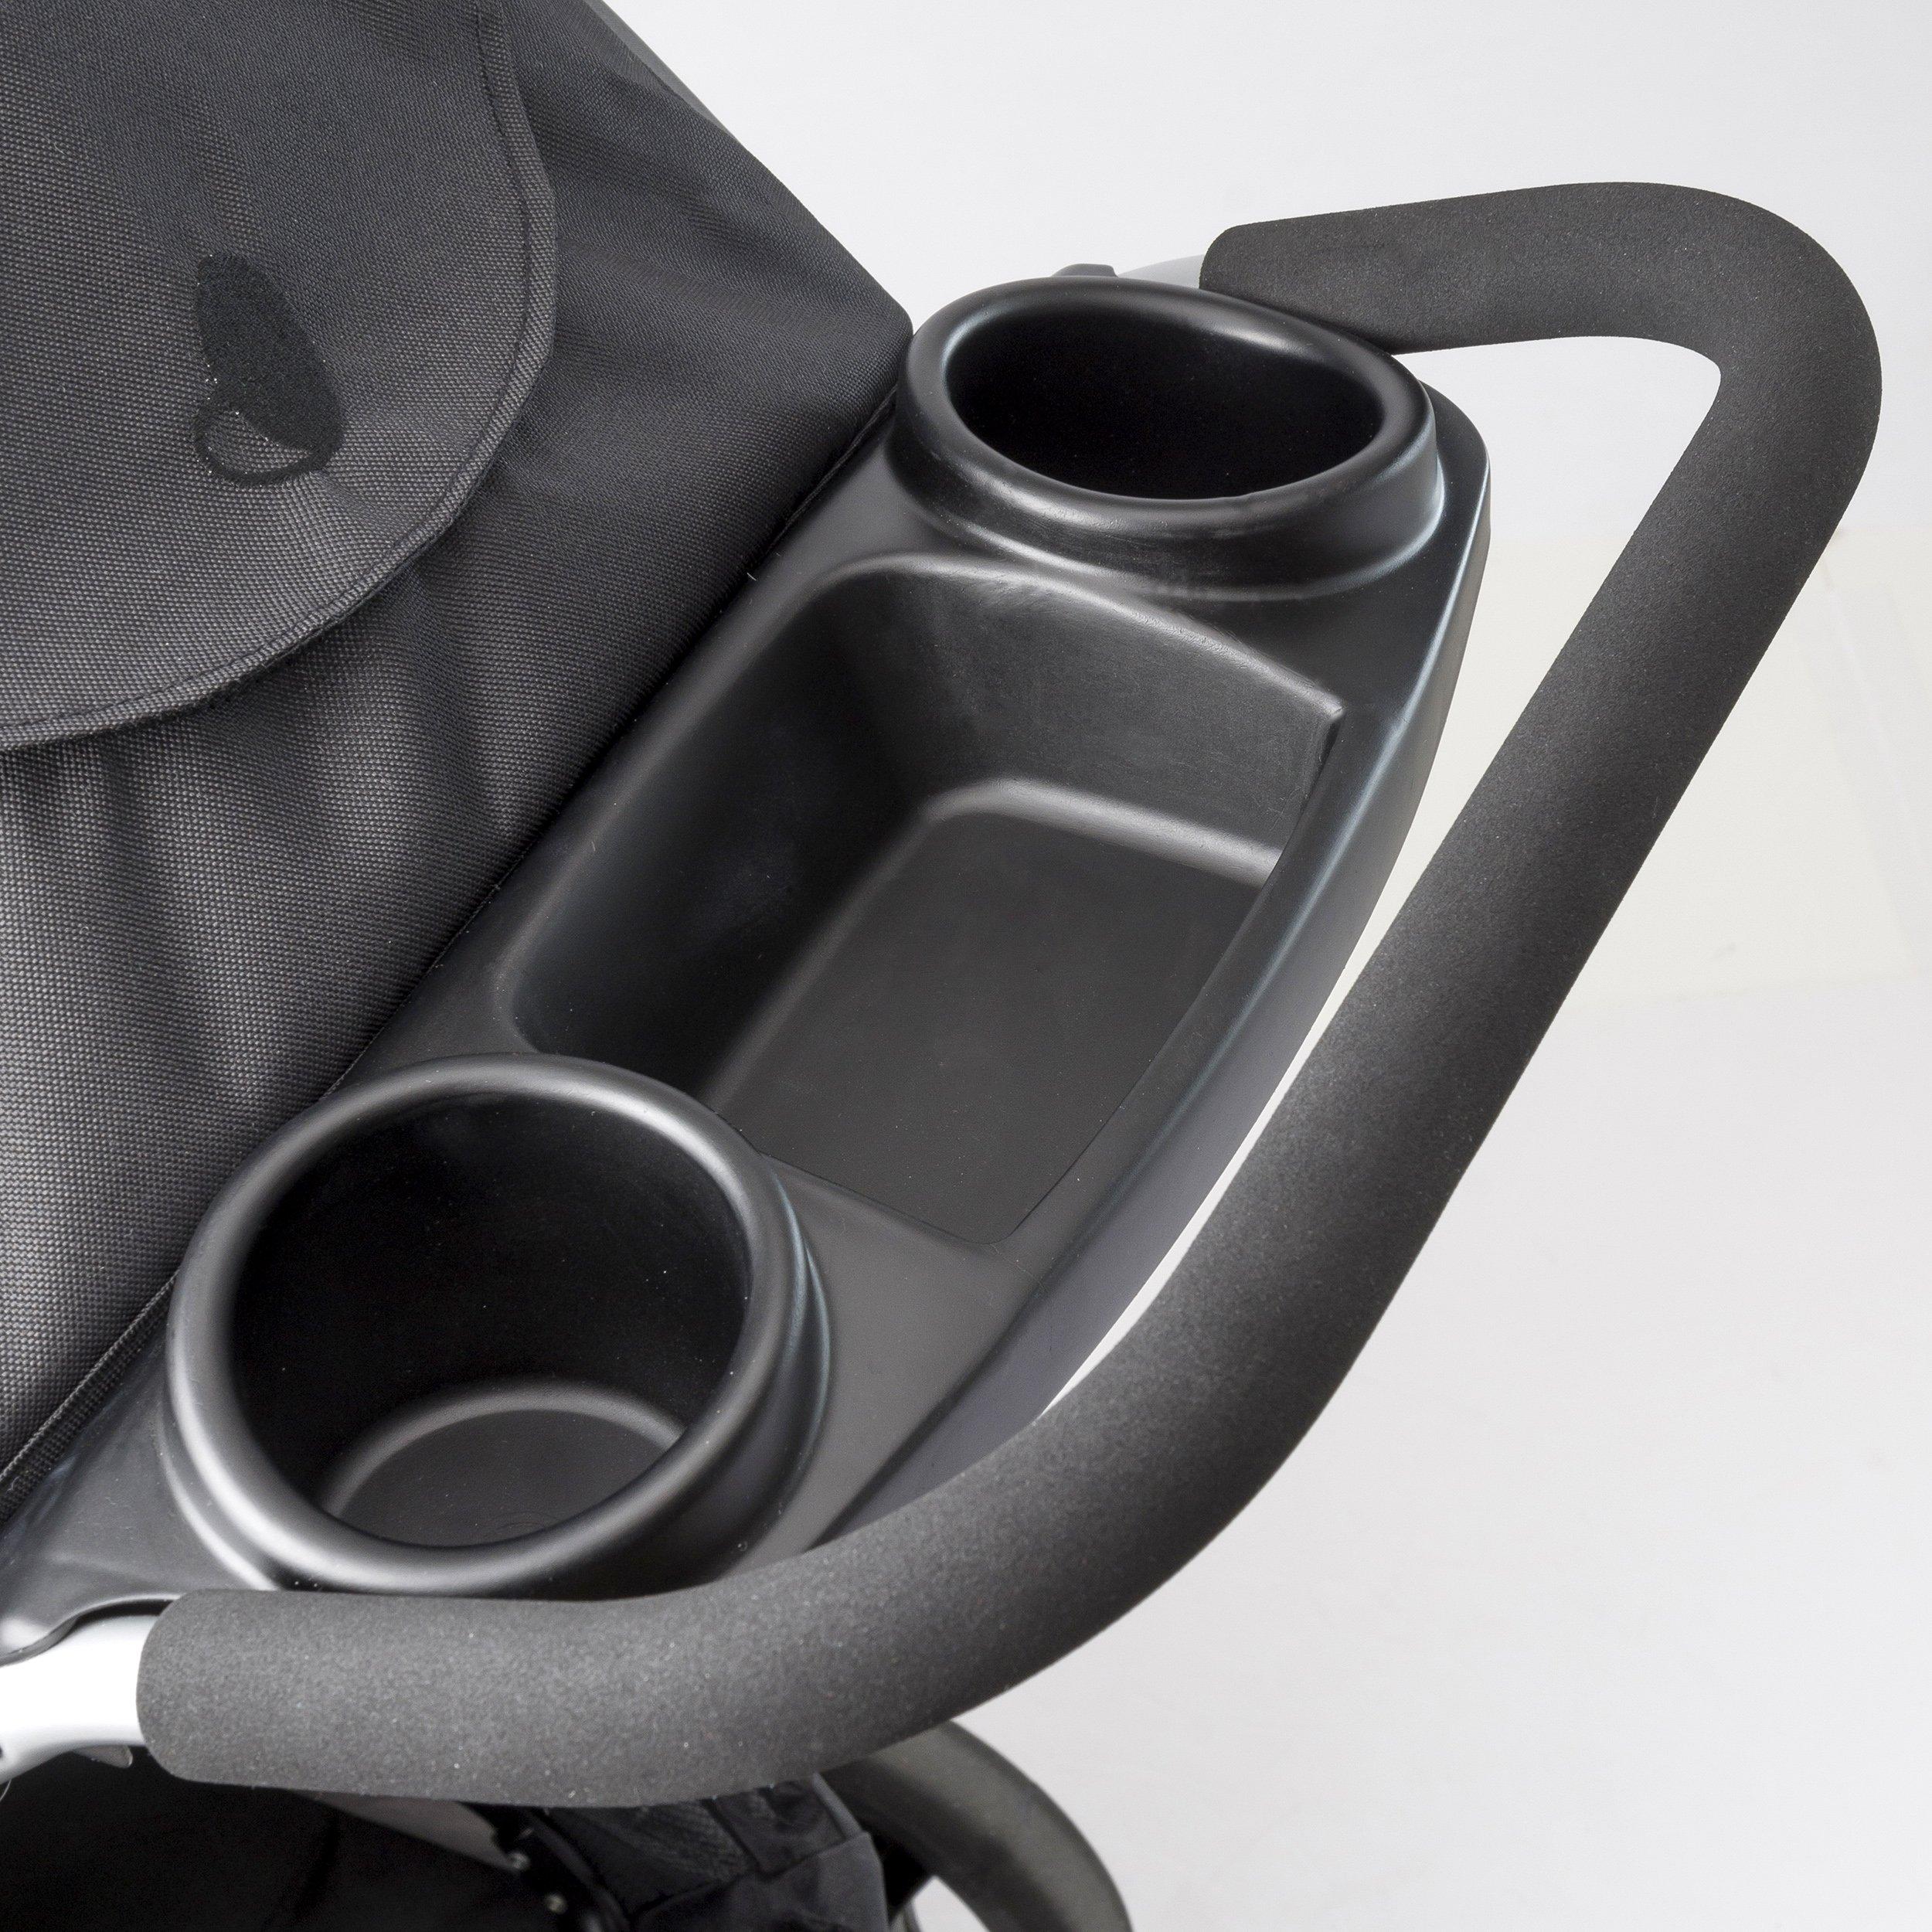 Evenflo Advanced SensorSafe Epic Travel System with LiteMax Infant Car Seat, Jet by Evenflo (Image #10)